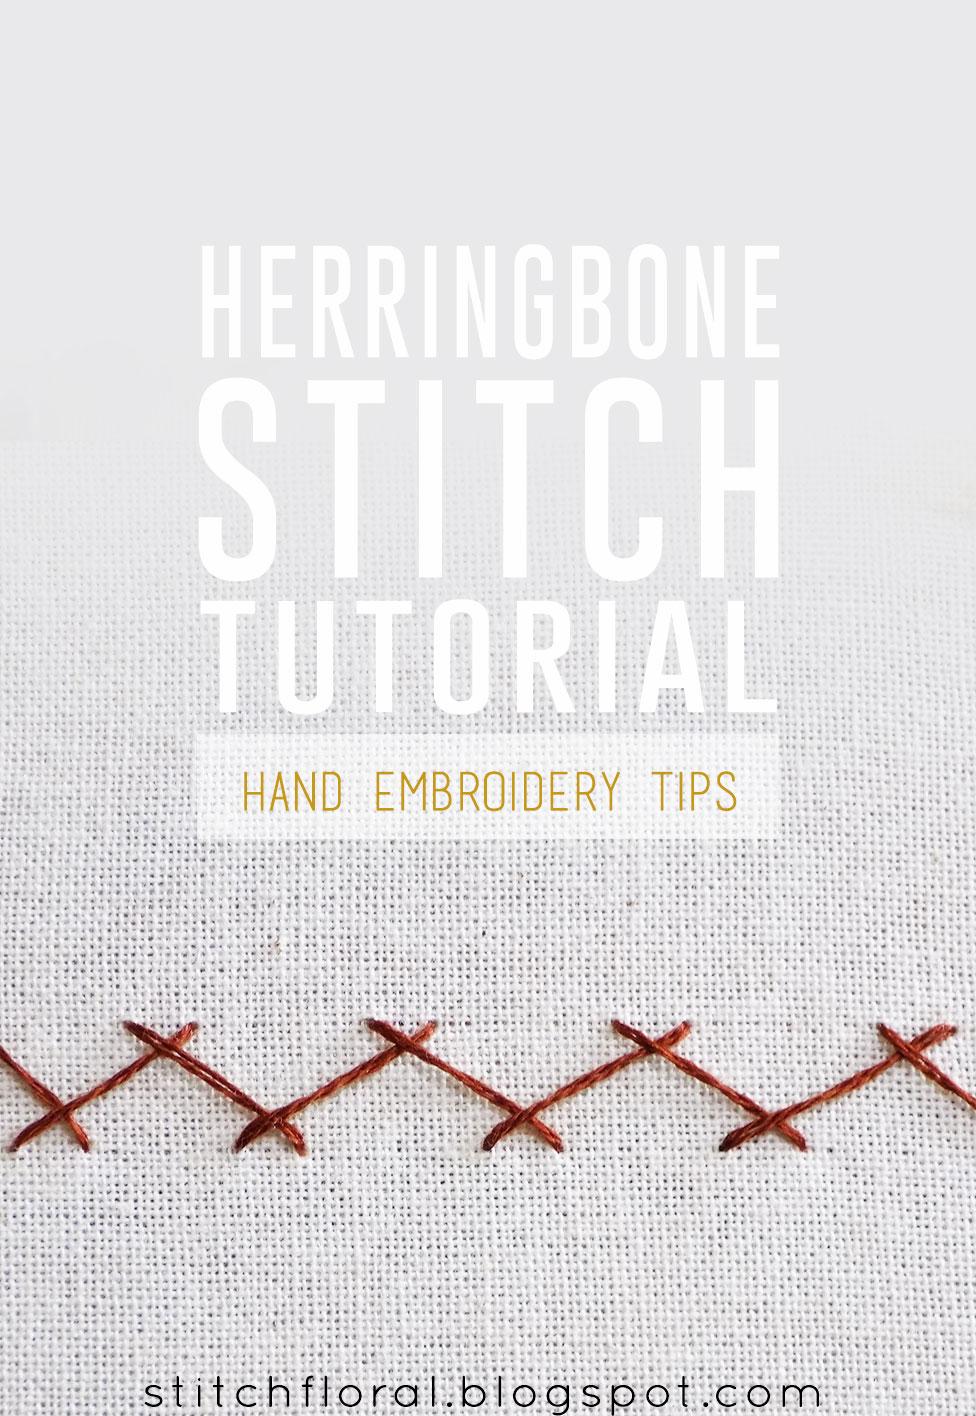 How to work herringbone stitch - Stitch Floral